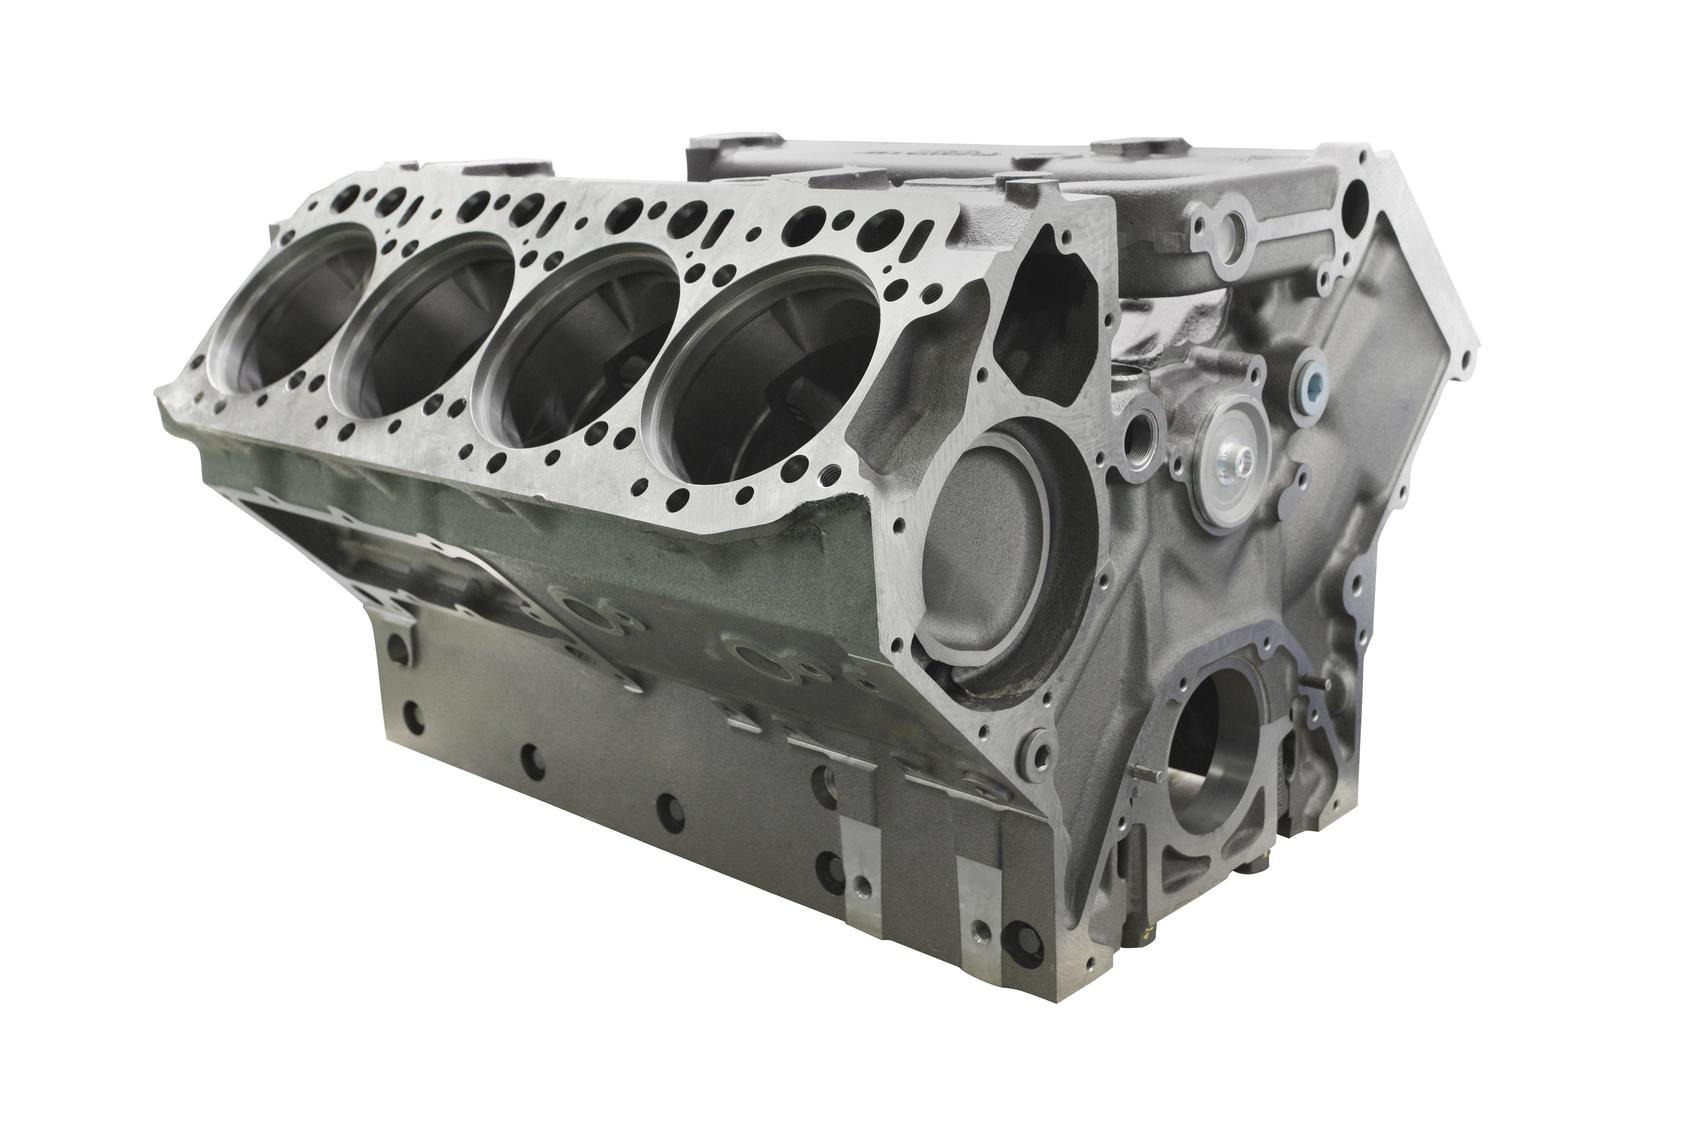 Locomotive Spare Parts : Marine engines for sale autos post